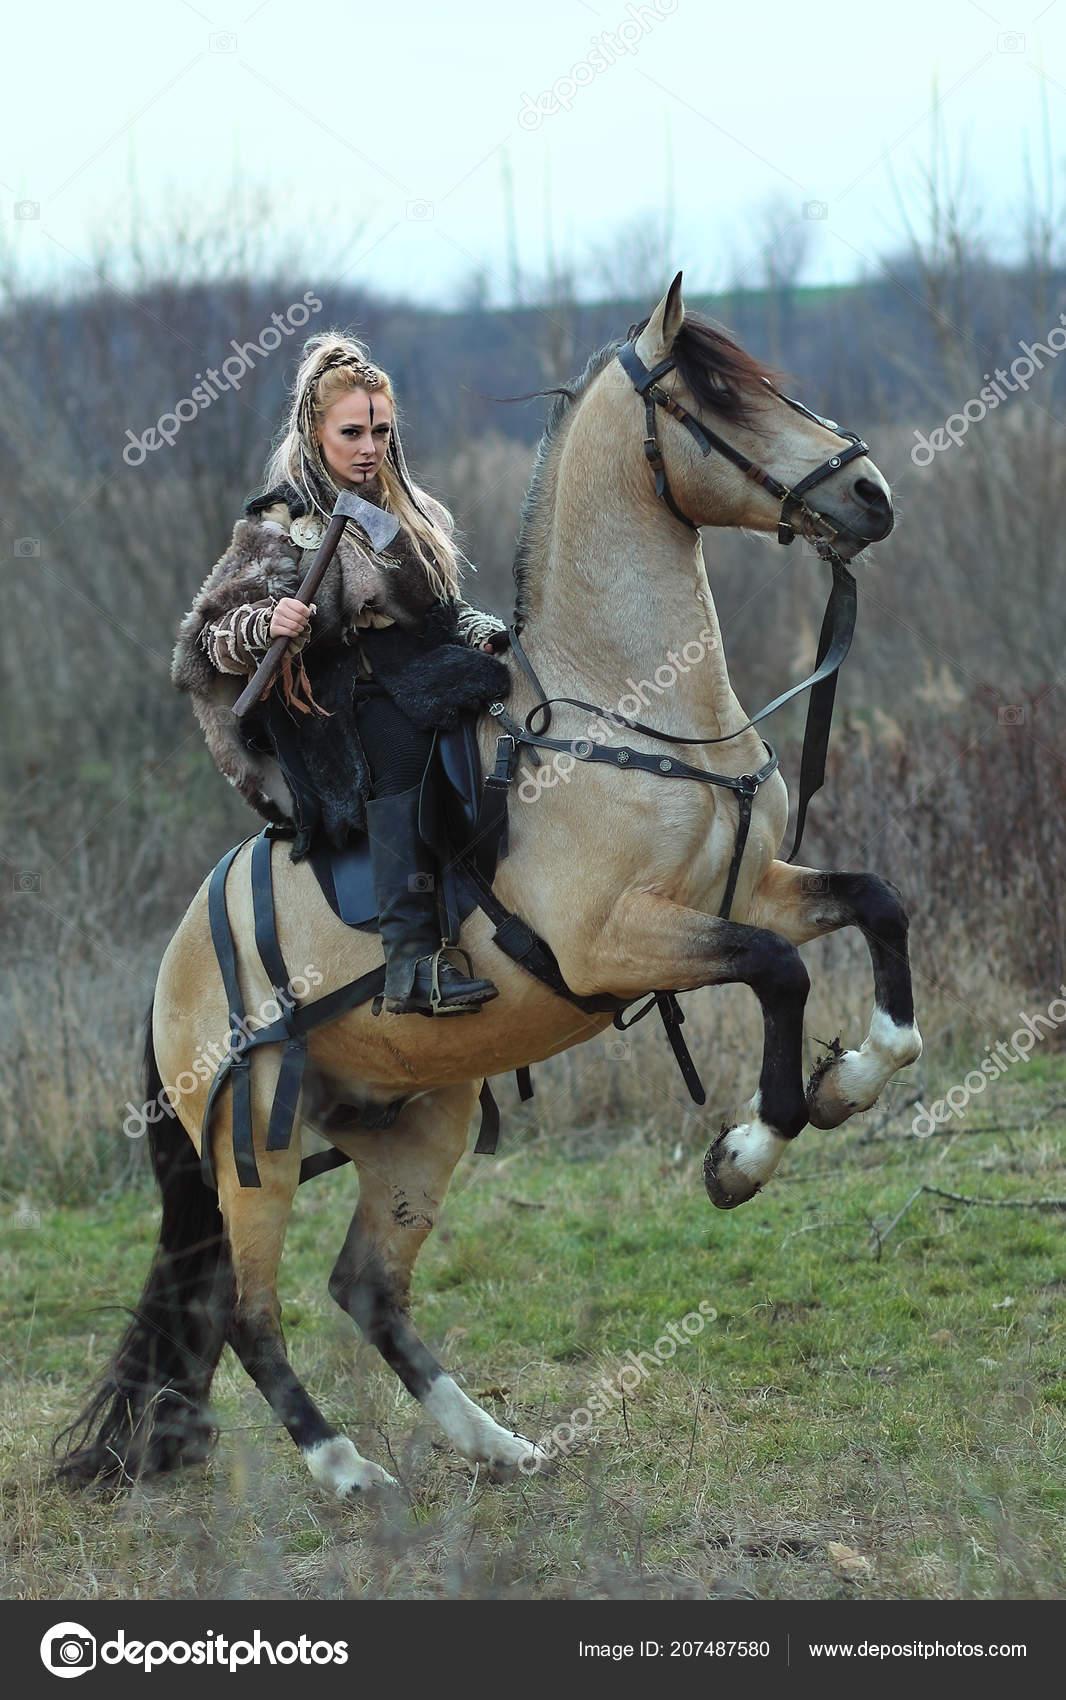 Viking Warrior Woman Makeup Blonde Viking Warrior Woman Riding Horse Hand Scandinavian Warrior Woman Stock Photo C Dan Rentea Yahoo Com 207487580